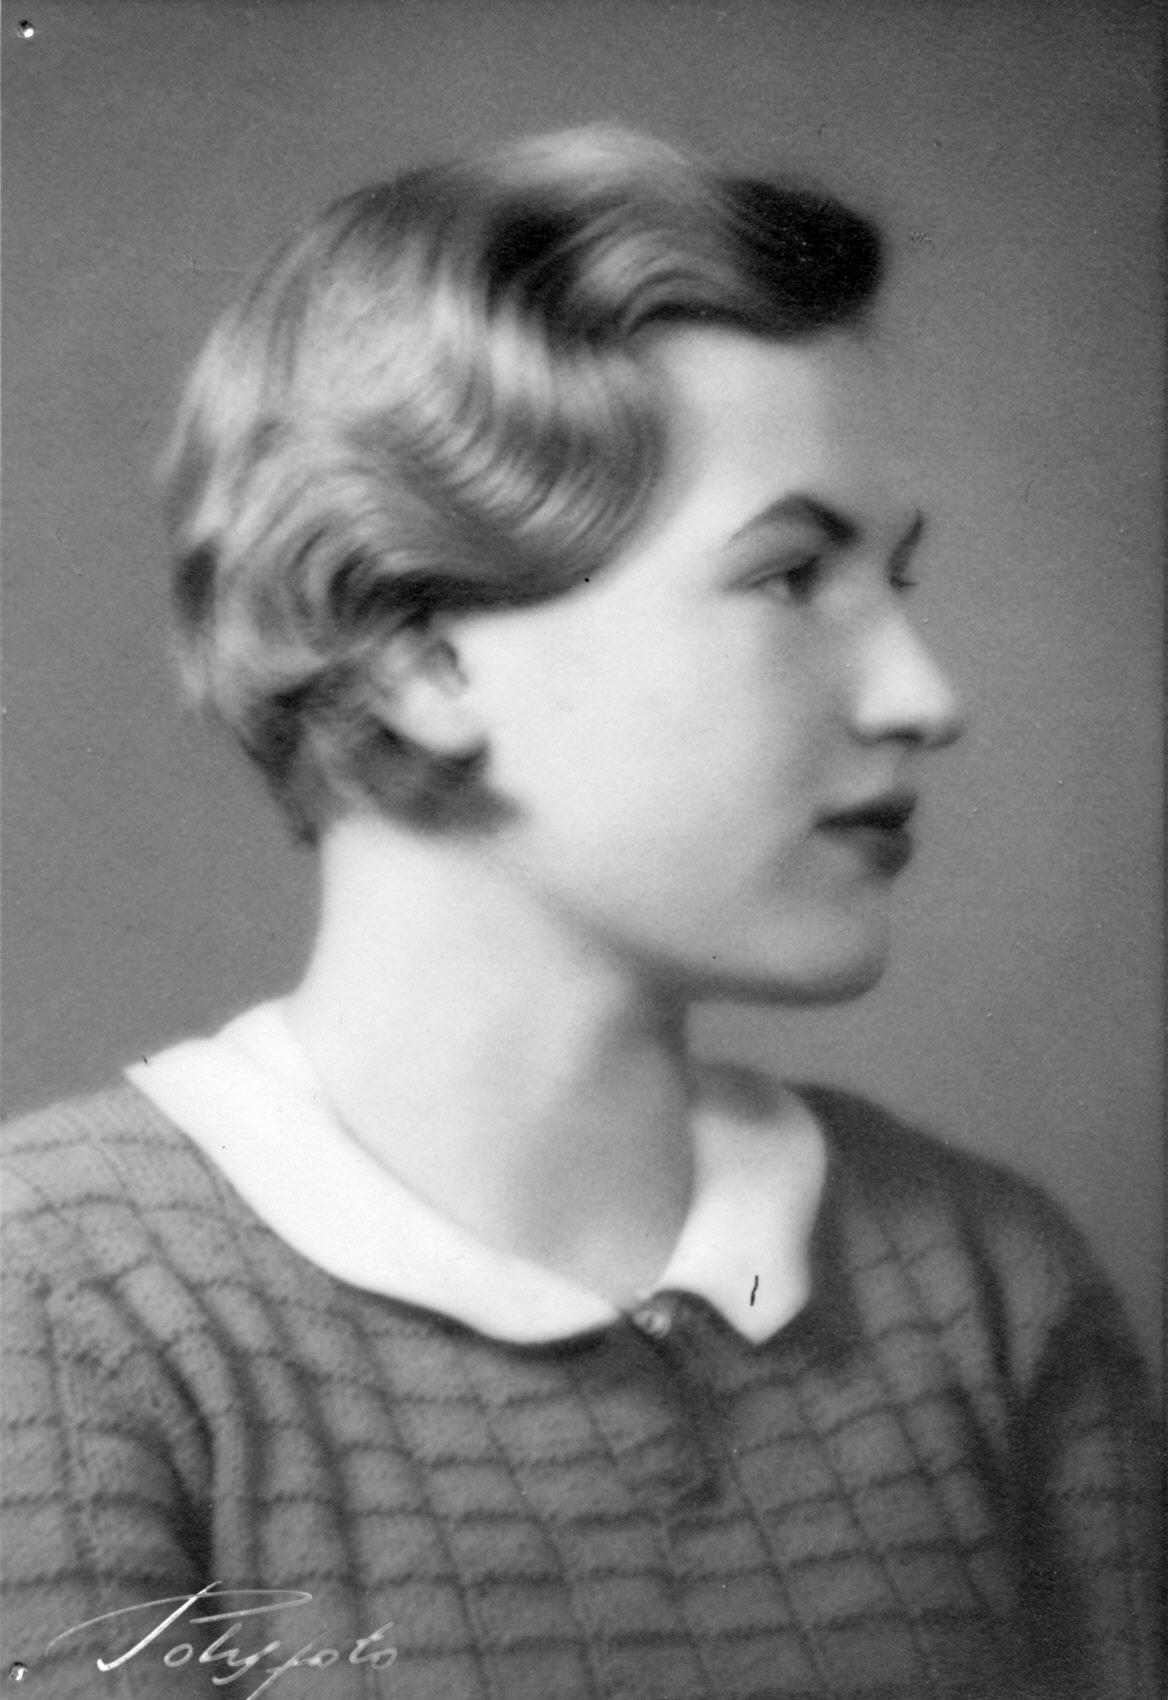 Ulla Heikel (1915-1940)